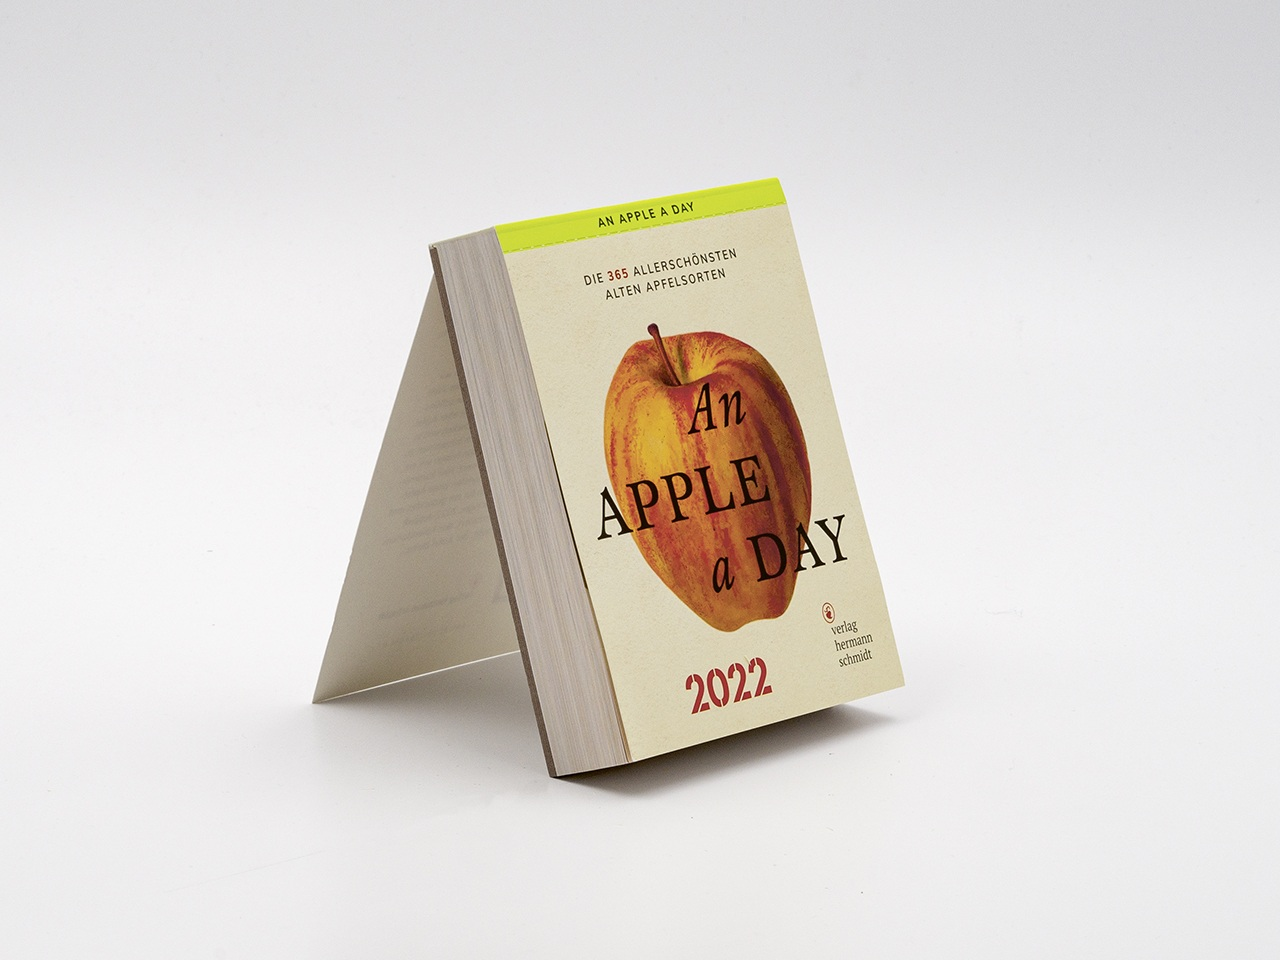 Vollansicht vom Kalender An Apple A Day 2022